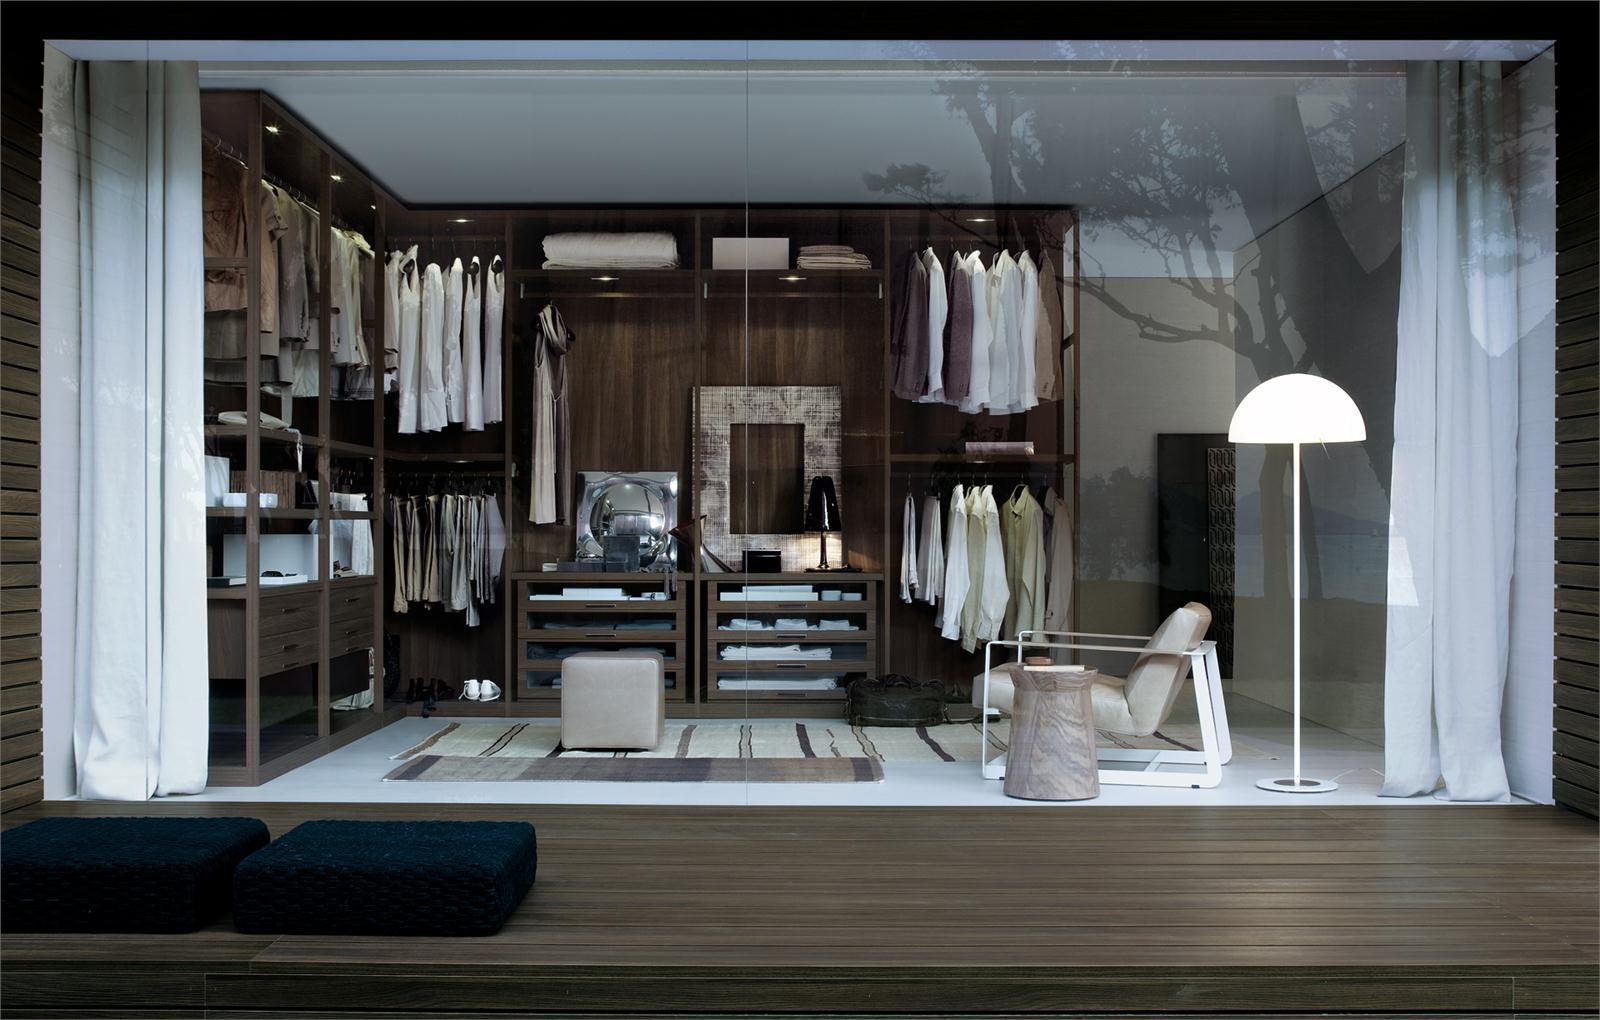 walk-in-closet-creative-picture-of-bedroom-closet